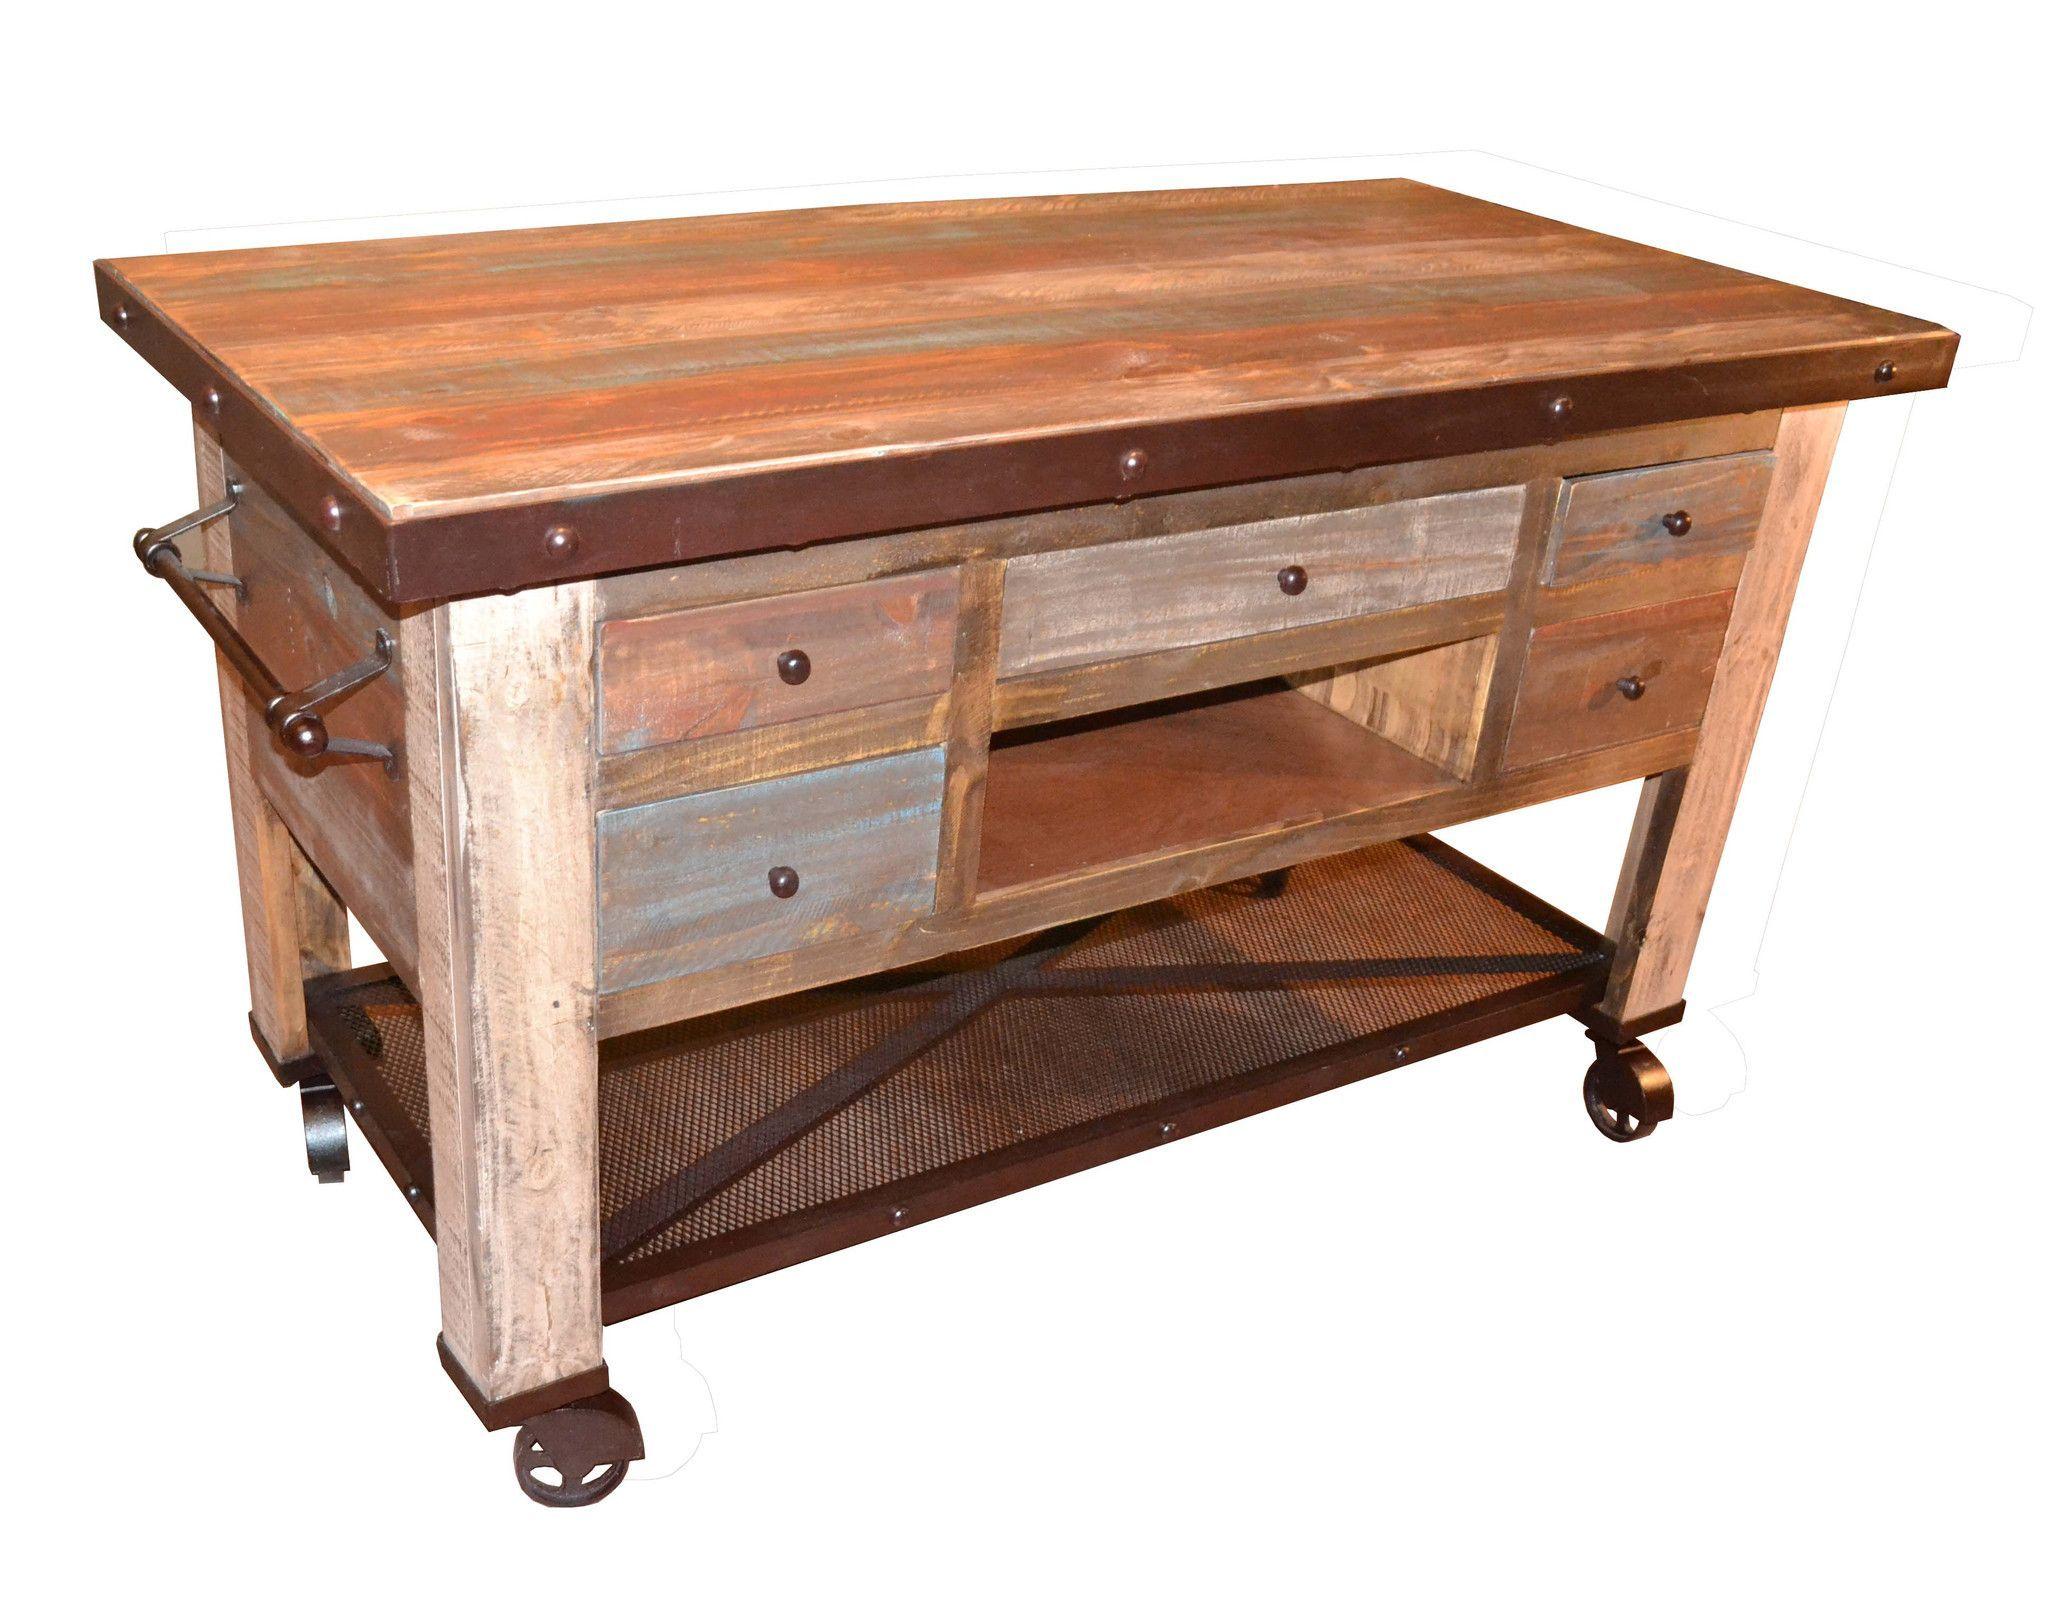 bayshore prep table bar table industrial bar cart reclaimed wood kitchen island on kitchen island ideas kitchen bar carts id=13159